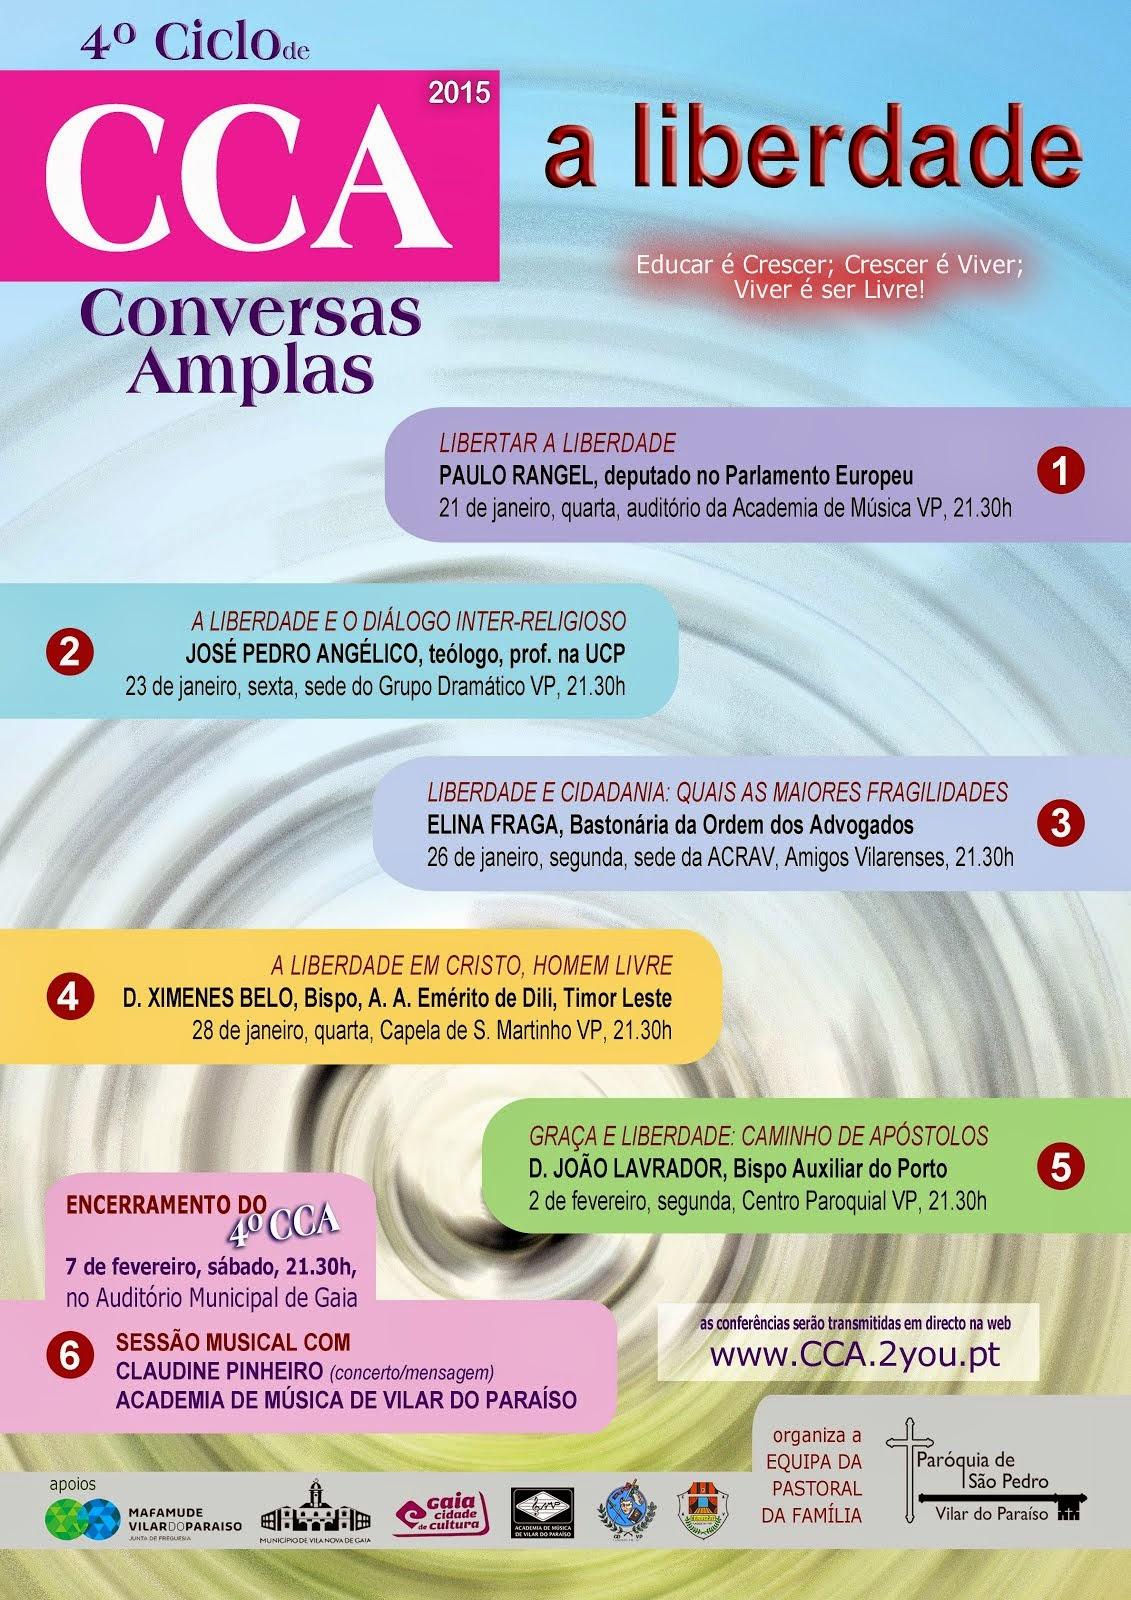 4º CICLO DE CONVERSAS AMPLAS